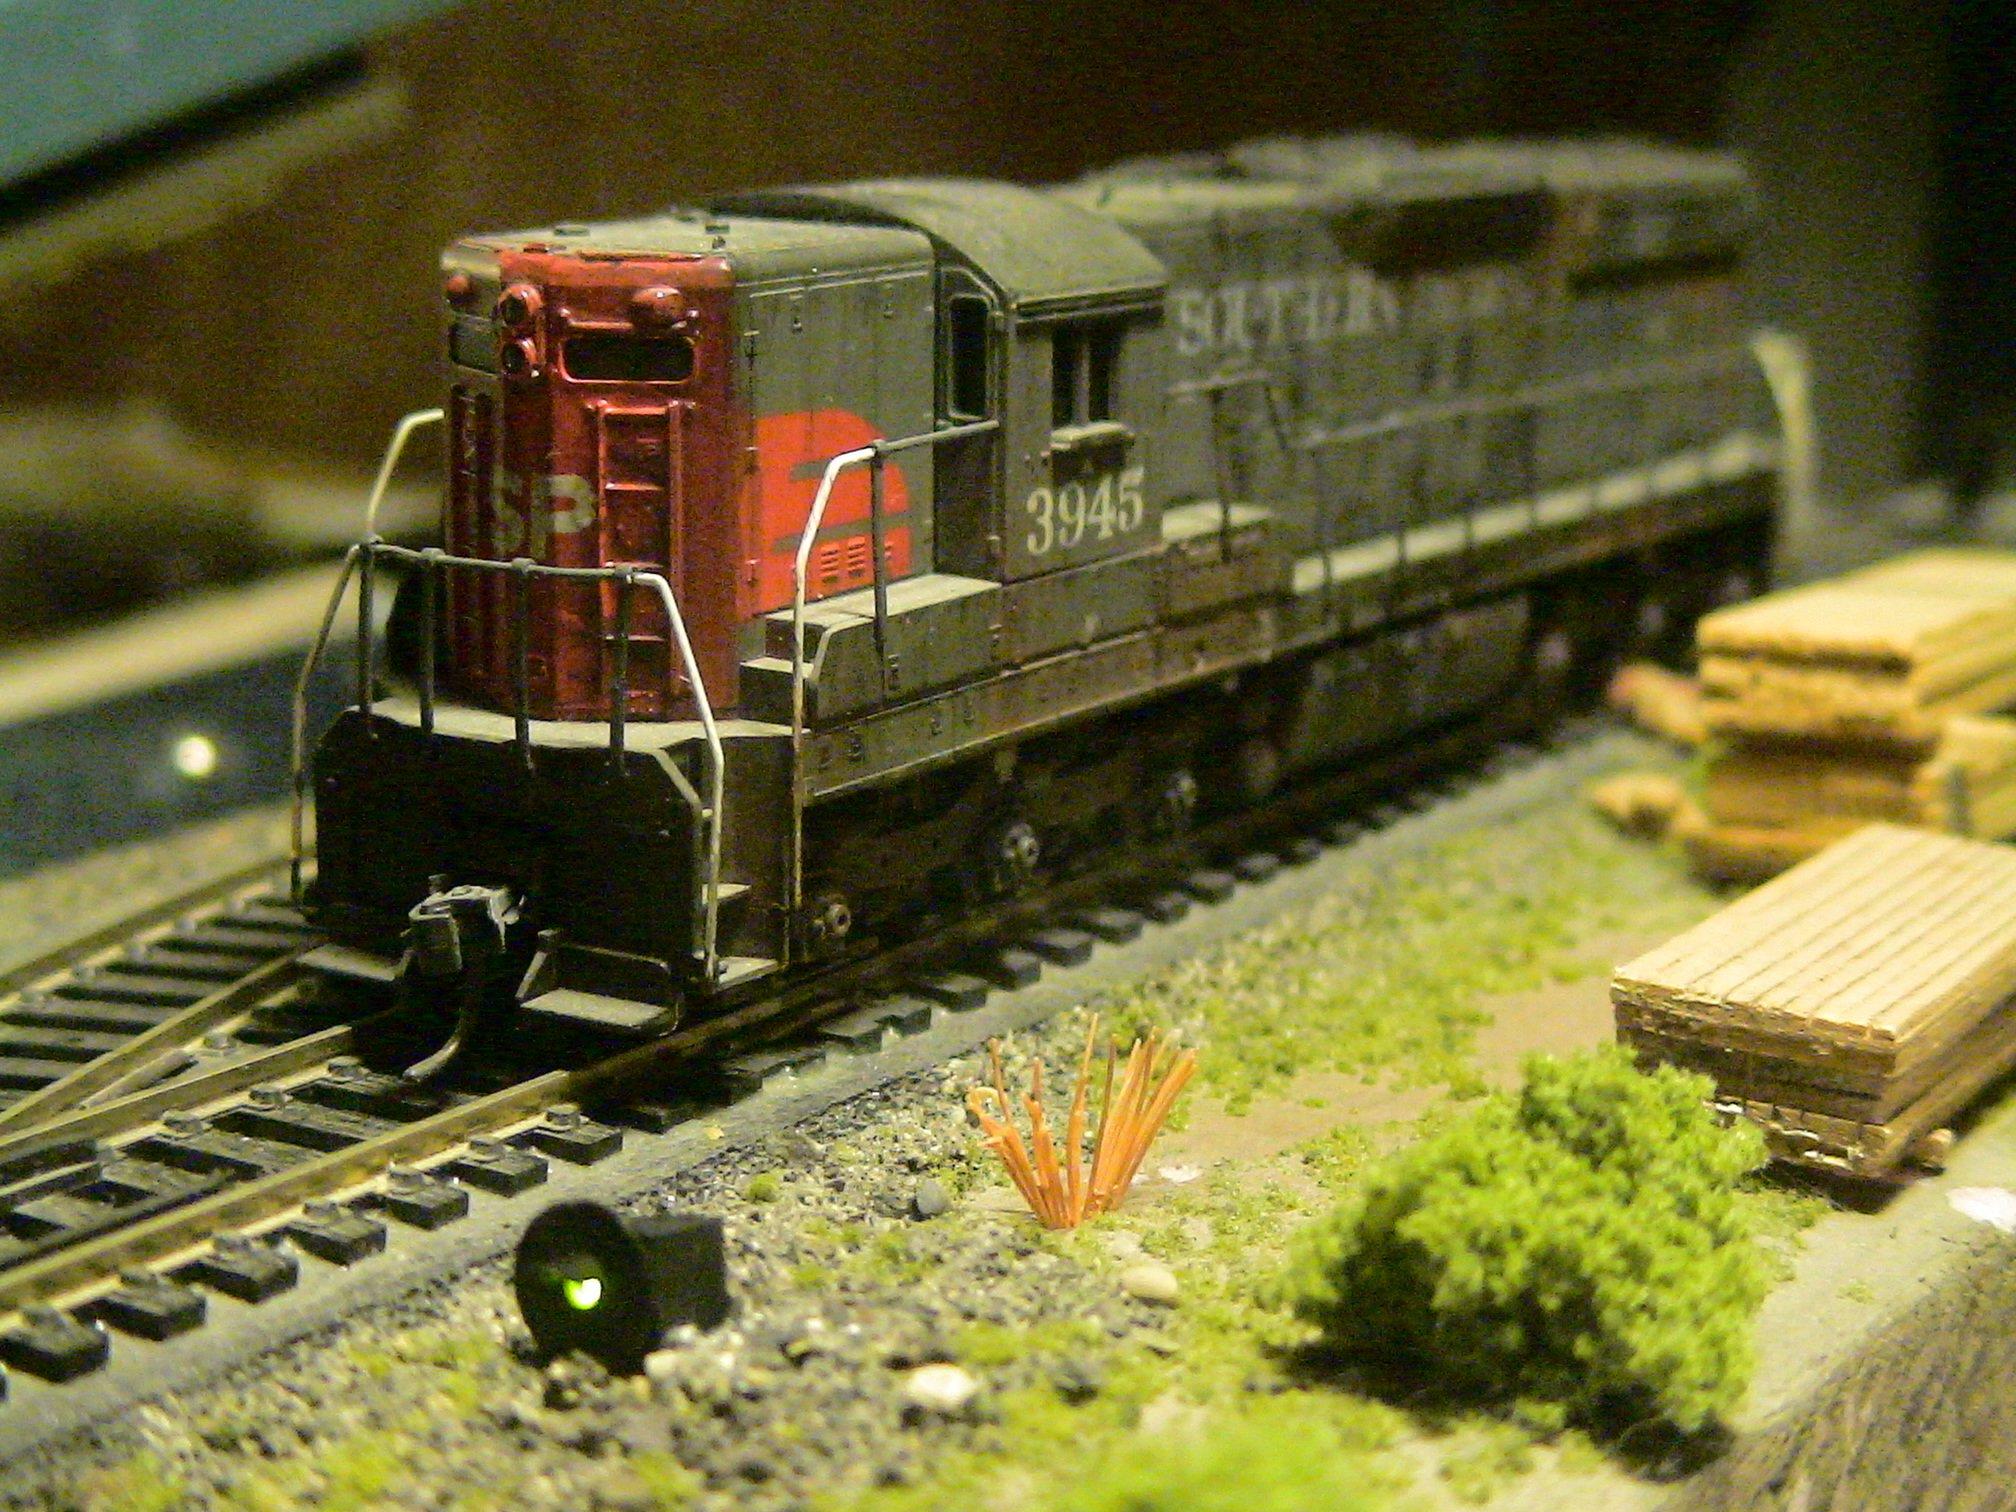 Leds And Kits For Ho Scale Model Railroads Railroad Flashing Light Circuit 1 Singloe Reen Target